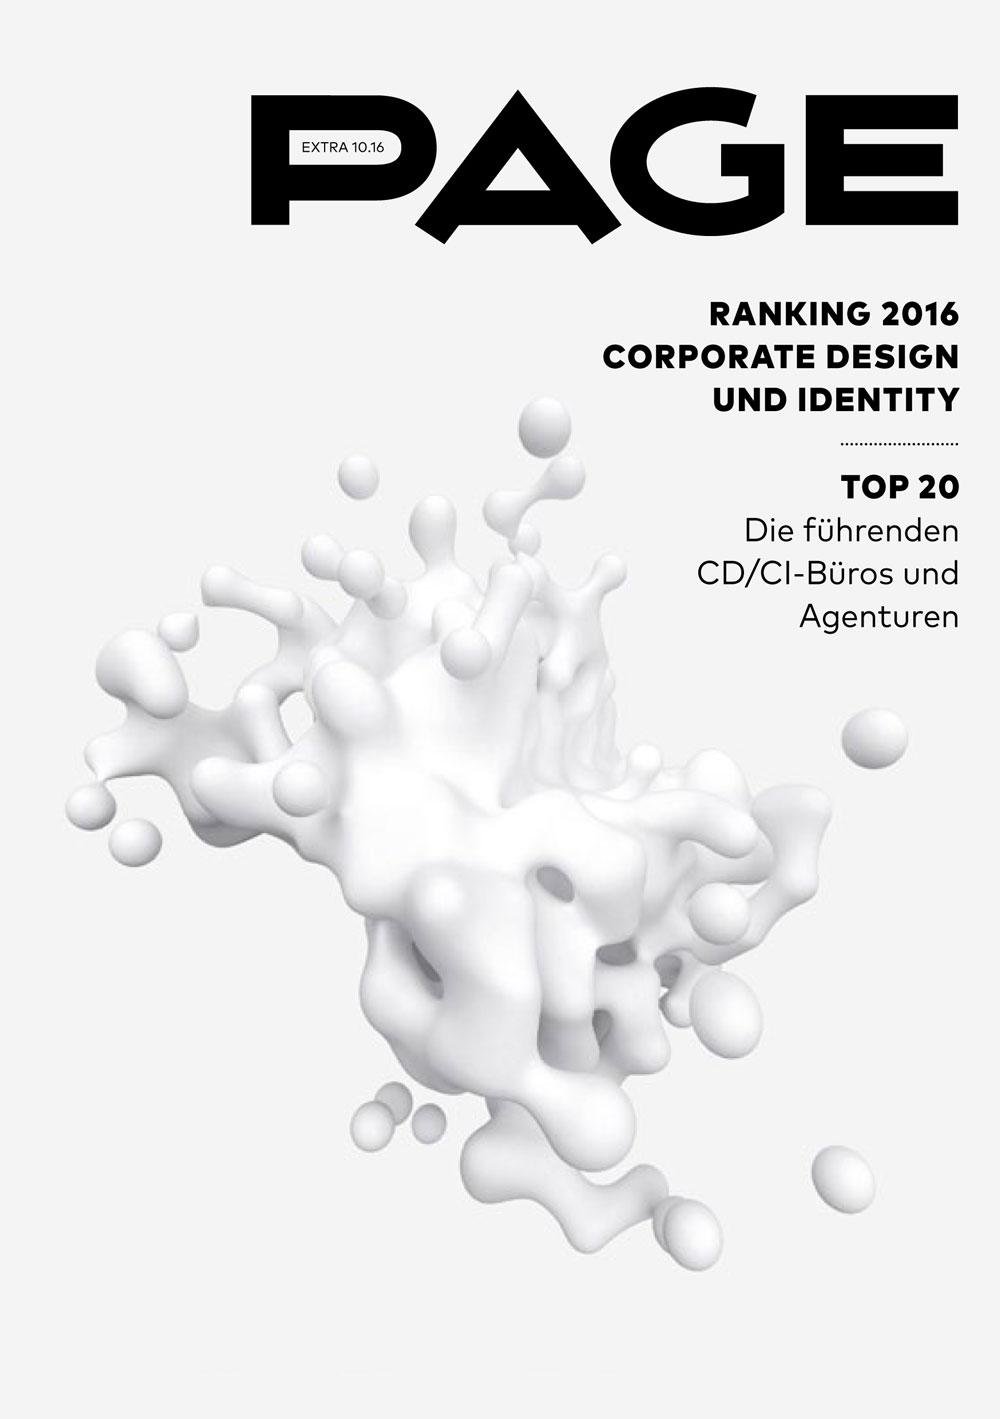 Produkt: eDossier: »PAGE CD/CI-Ranking 2016«